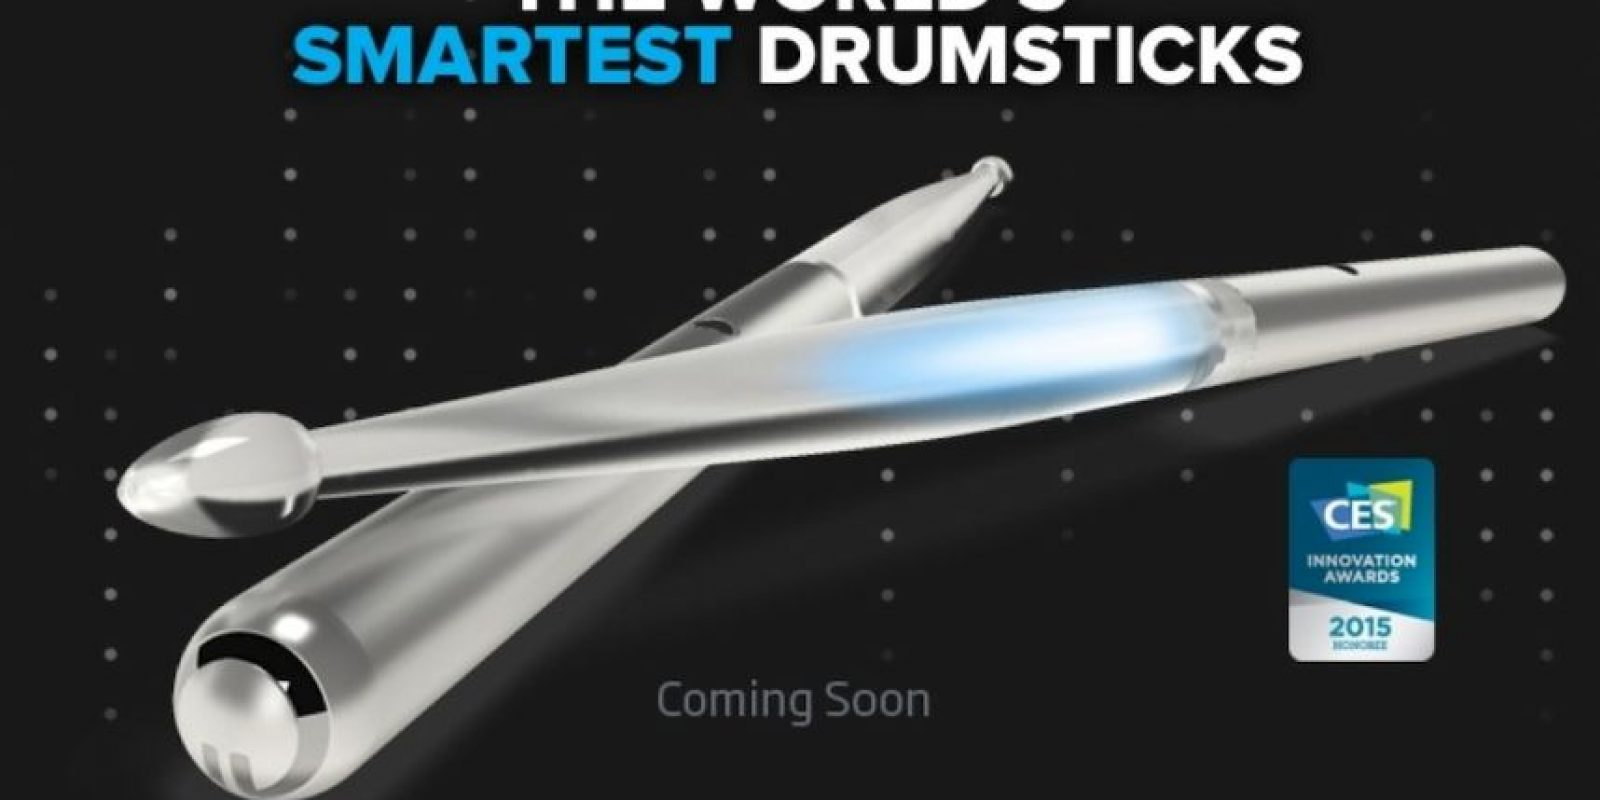 Smartest Drumsticks Foto:muzikofficial.com